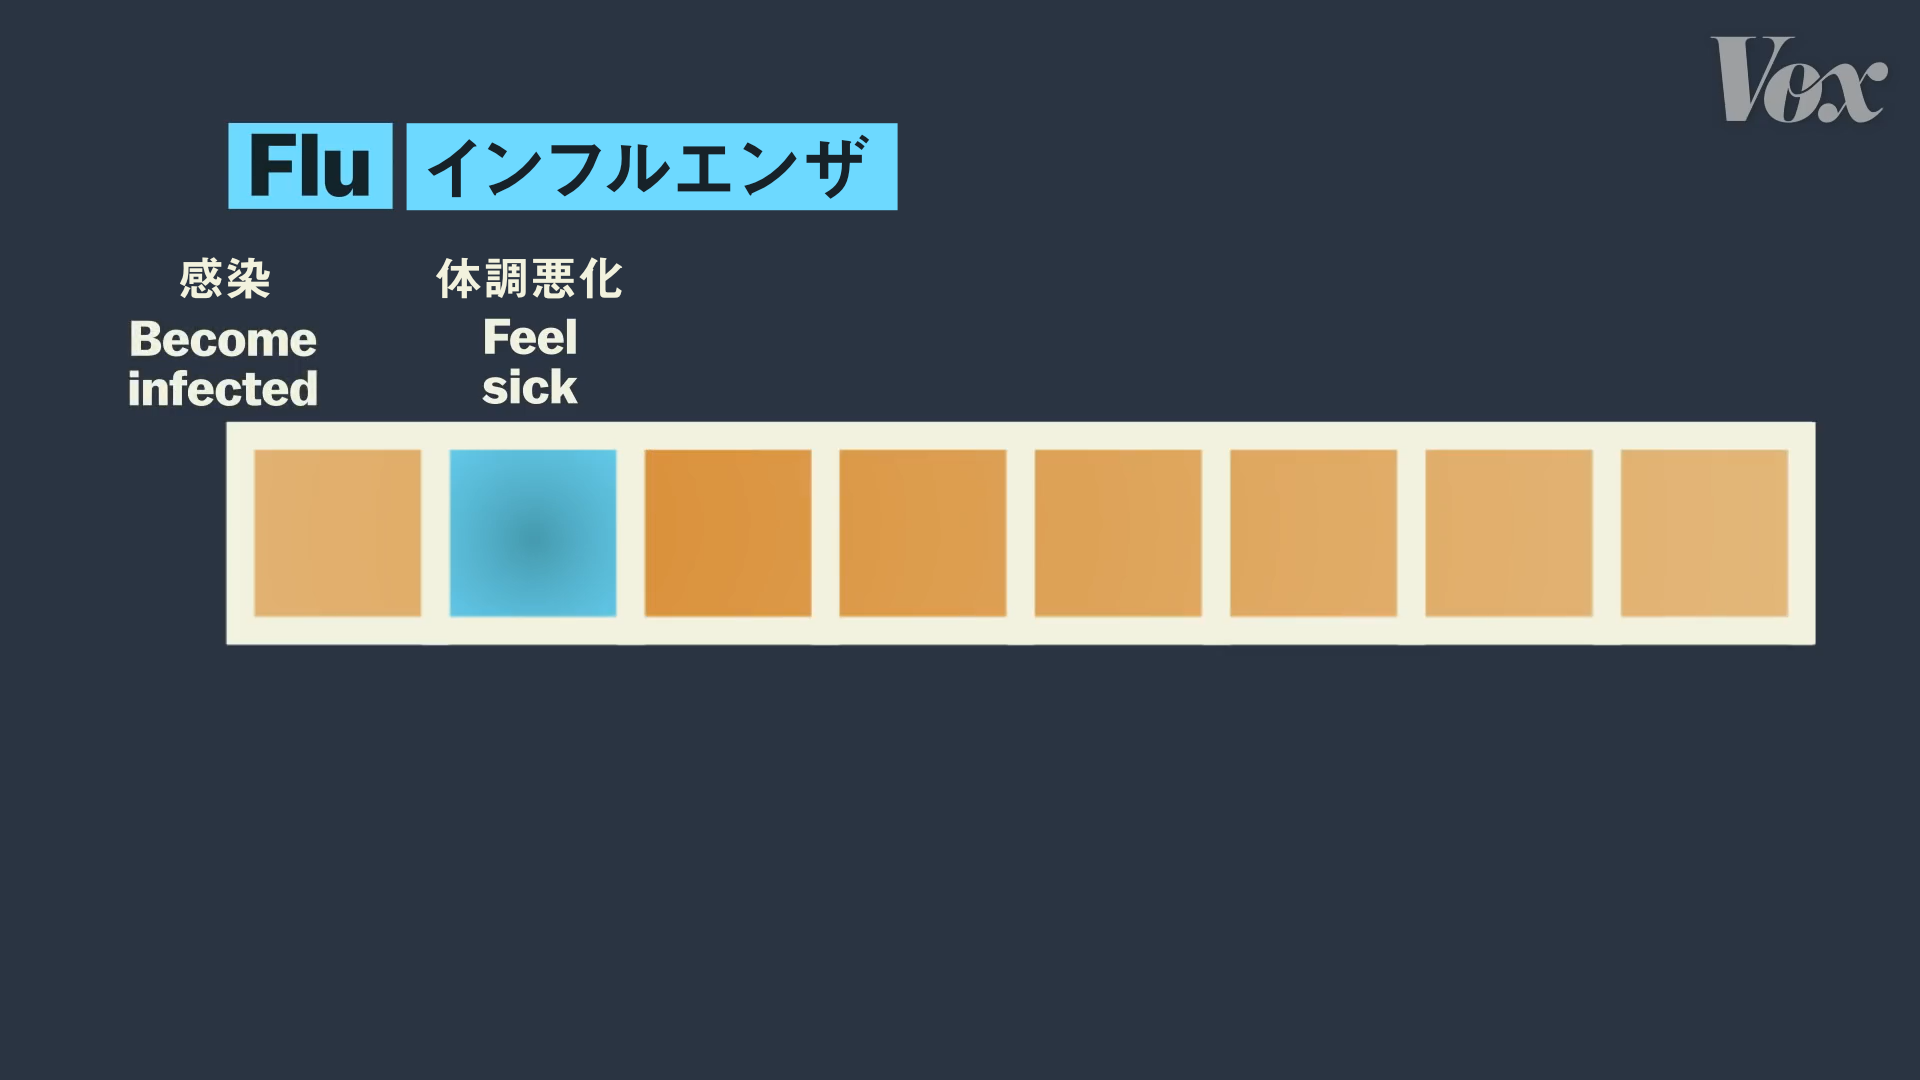 f:id:Imamura:20200408133325p:plain